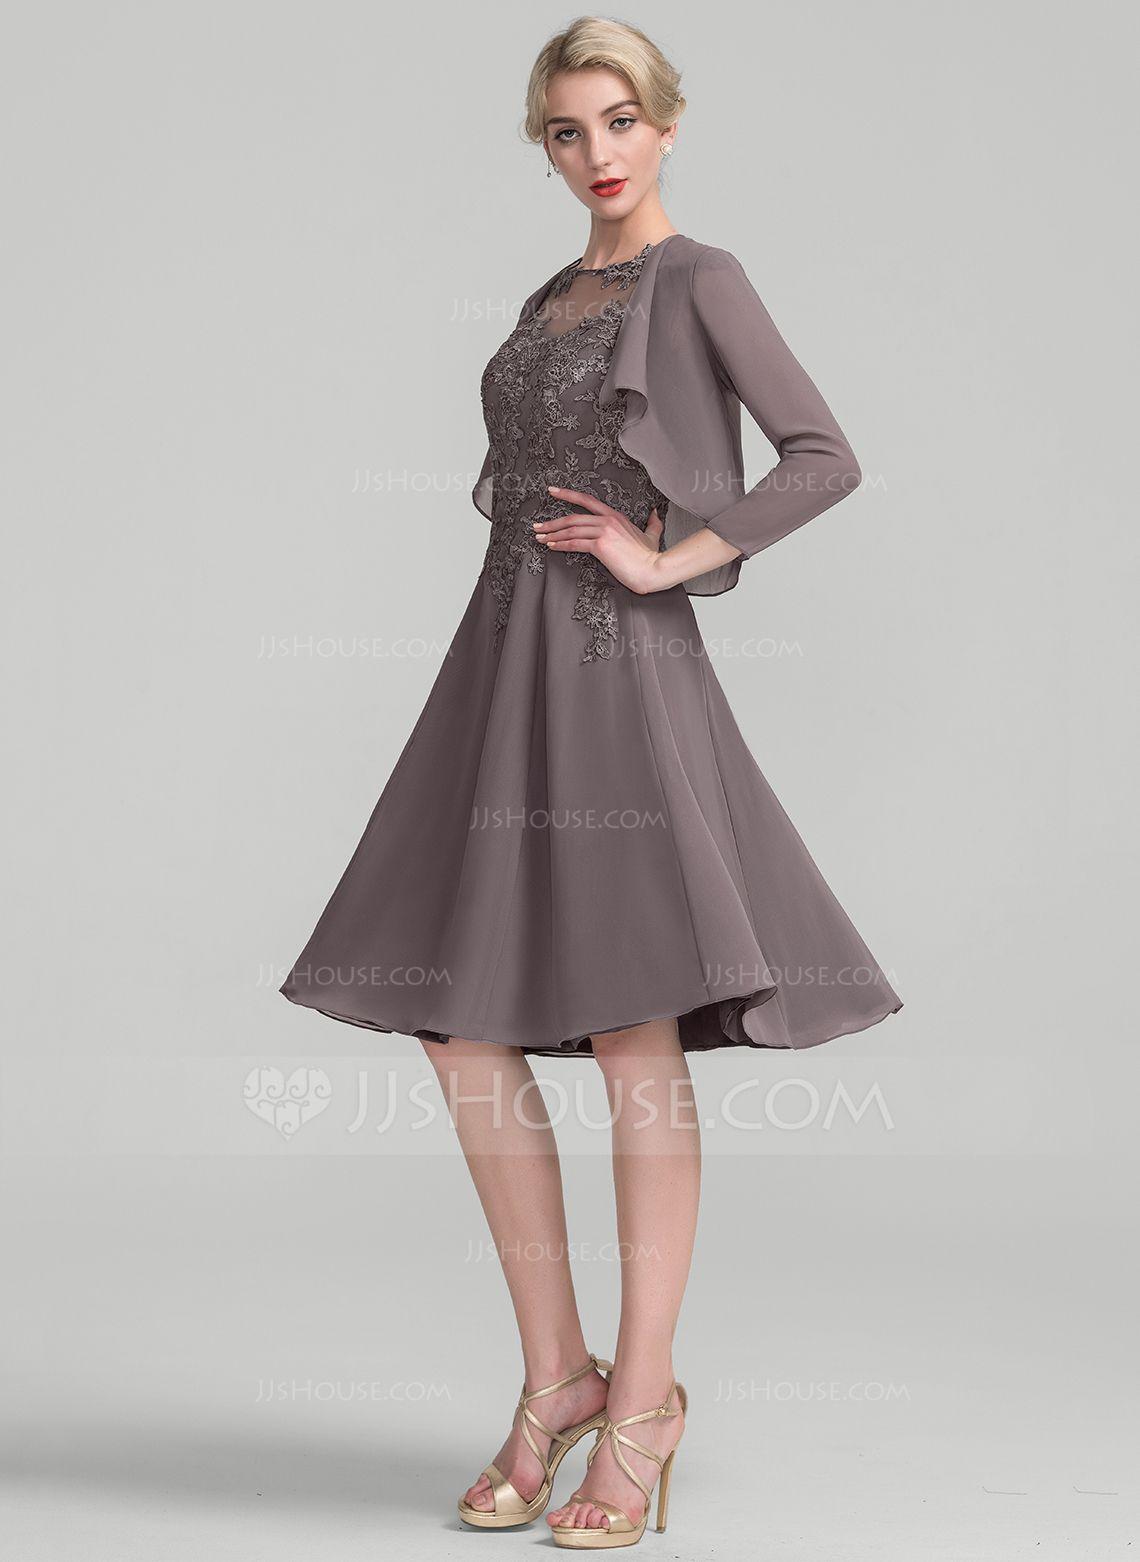 US$ 14.14] A-Line/Princess Scoop Neck Knee-Length Chiffon Lace